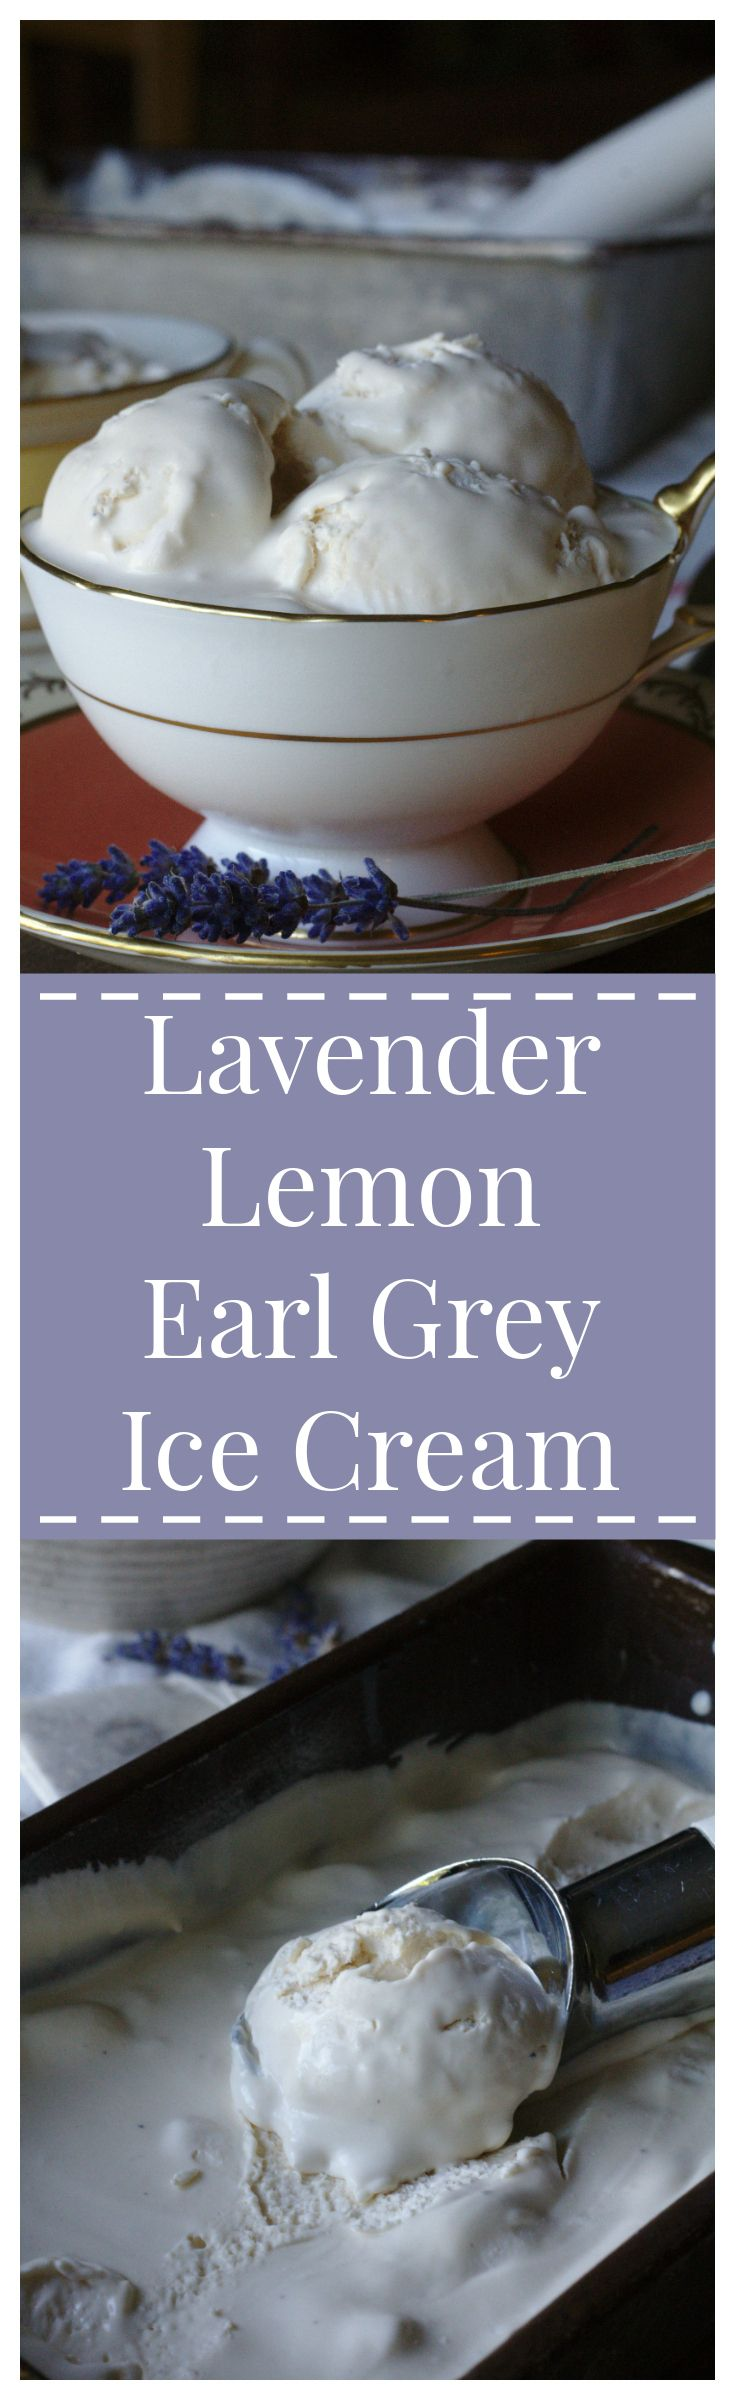 Lavender Lemon Earl Grey Ice Cream – A simple, yet elegant dessert made with lavender earl grey tea, fresh lemon juice, and creamy no-churn ice cream base.